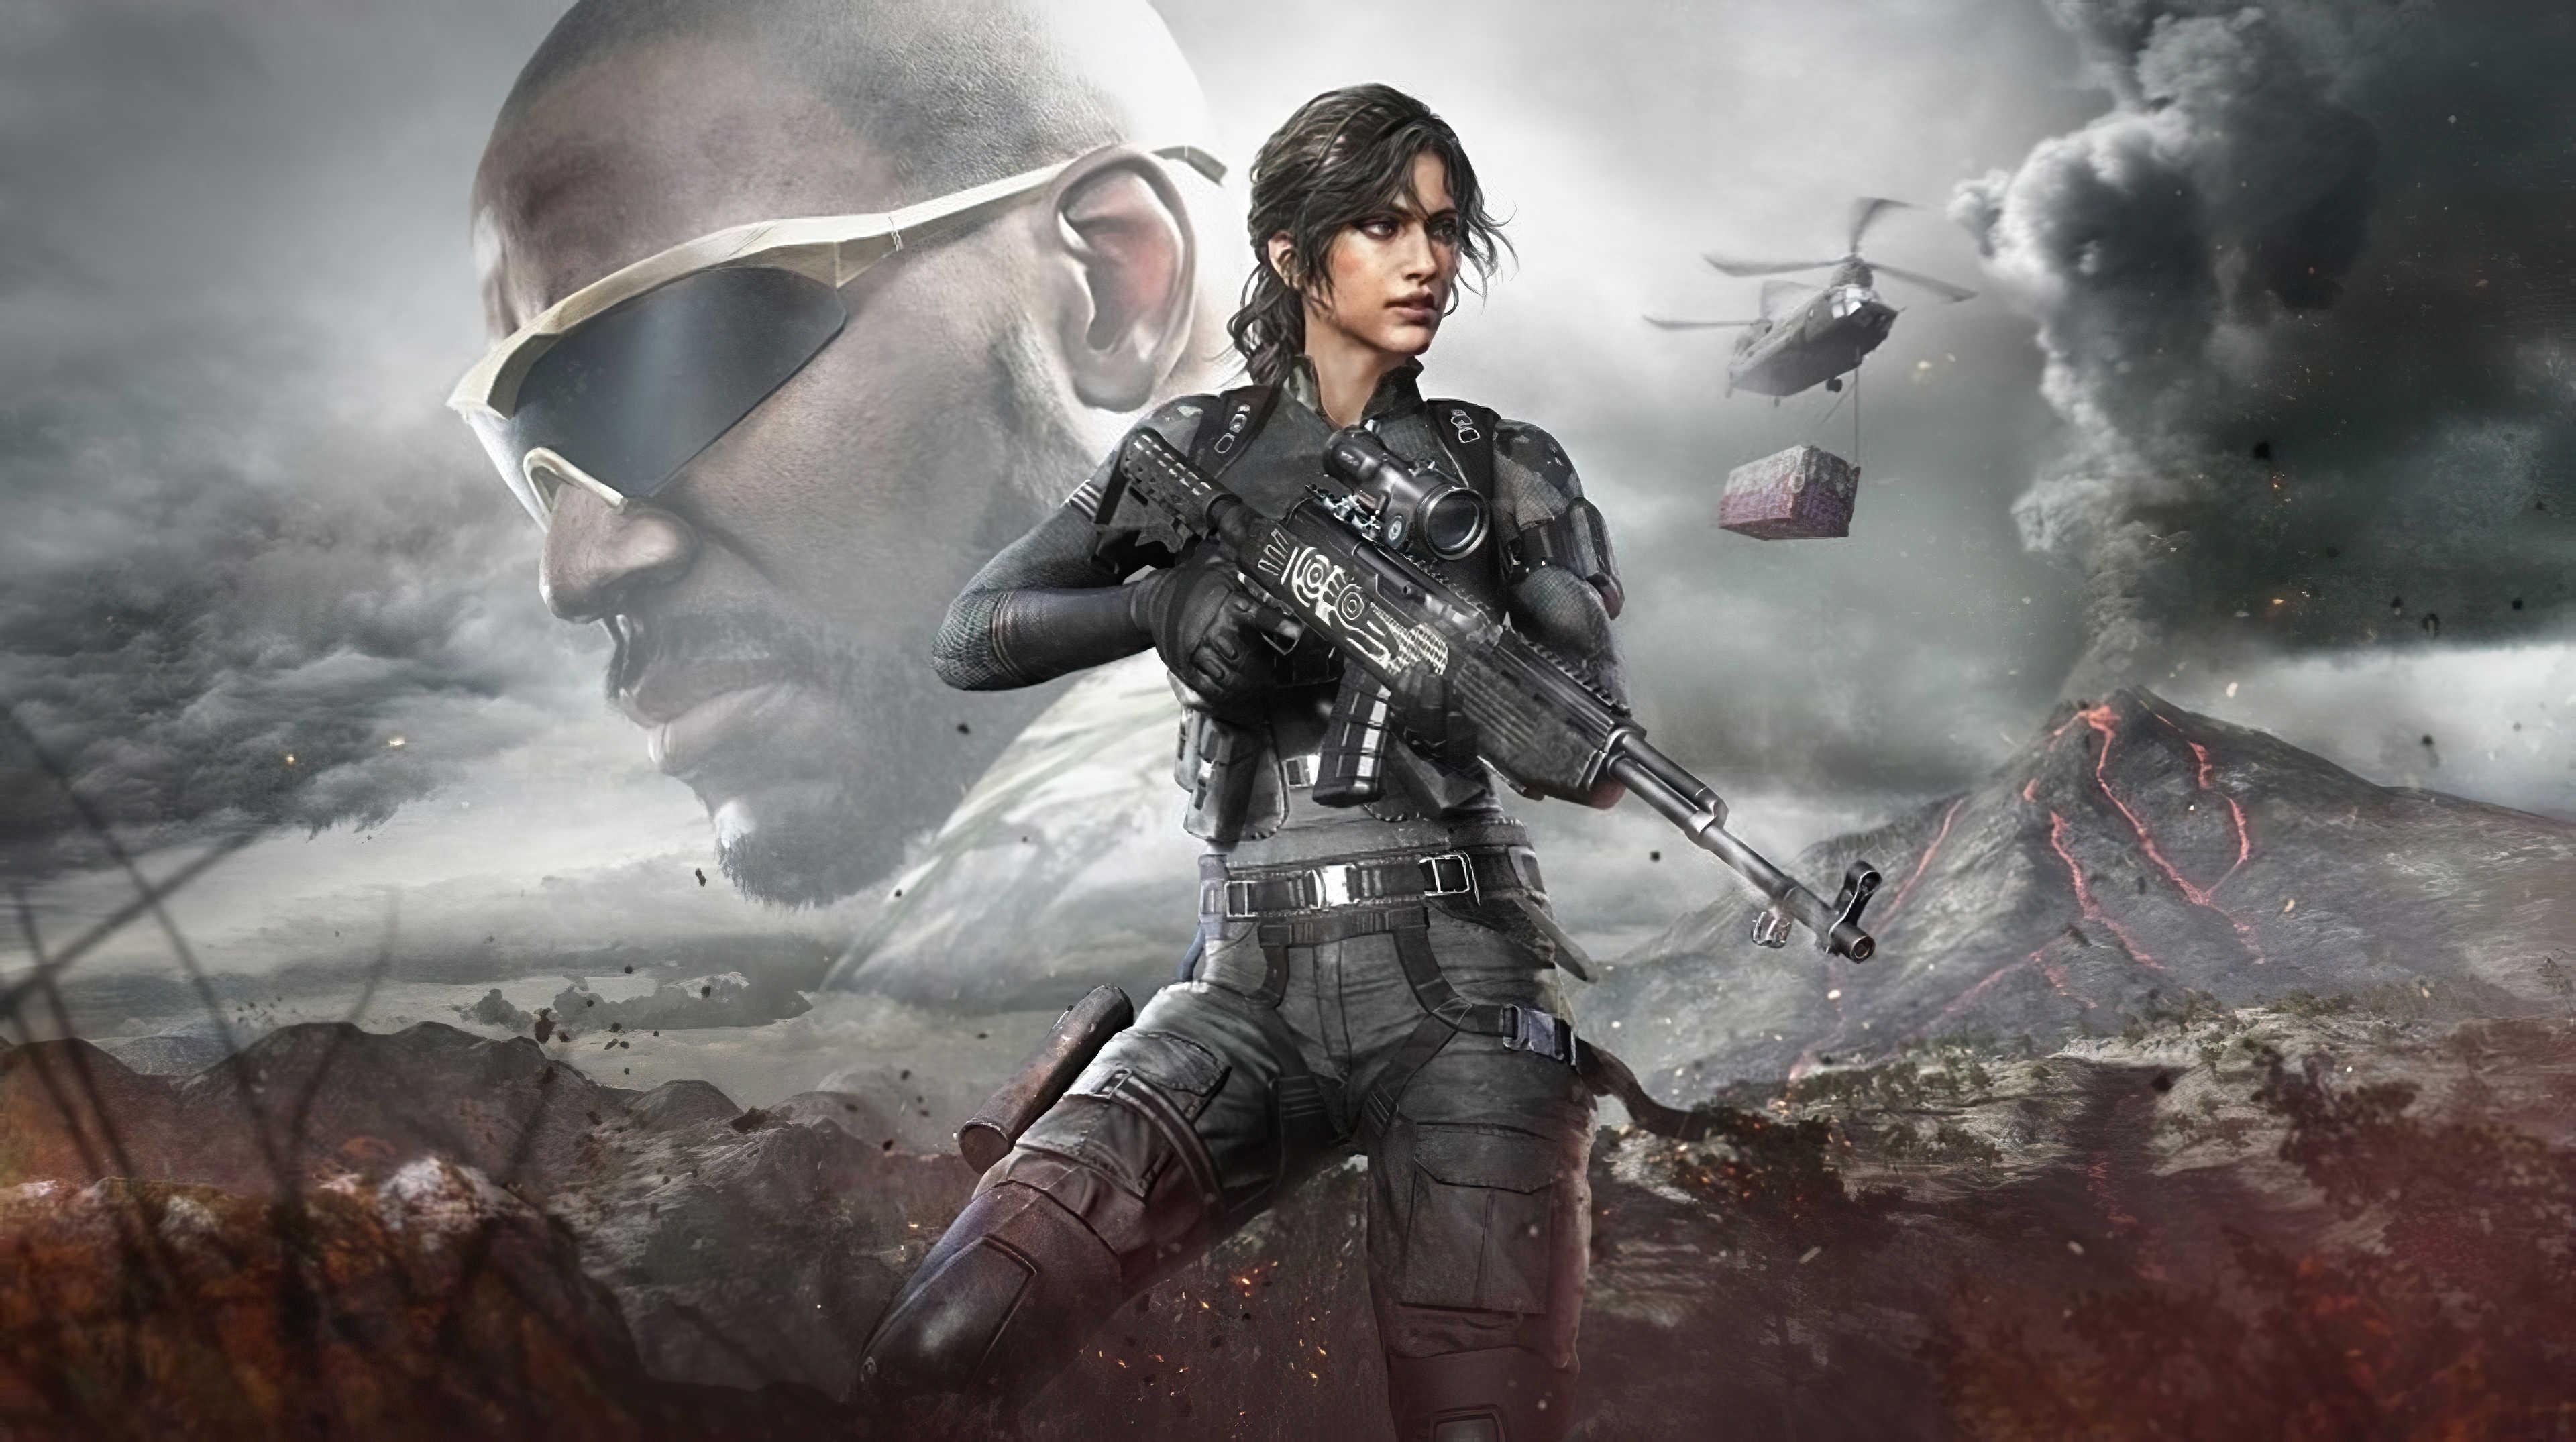 Pubg Hd Games 4k Image Background Wallpaper